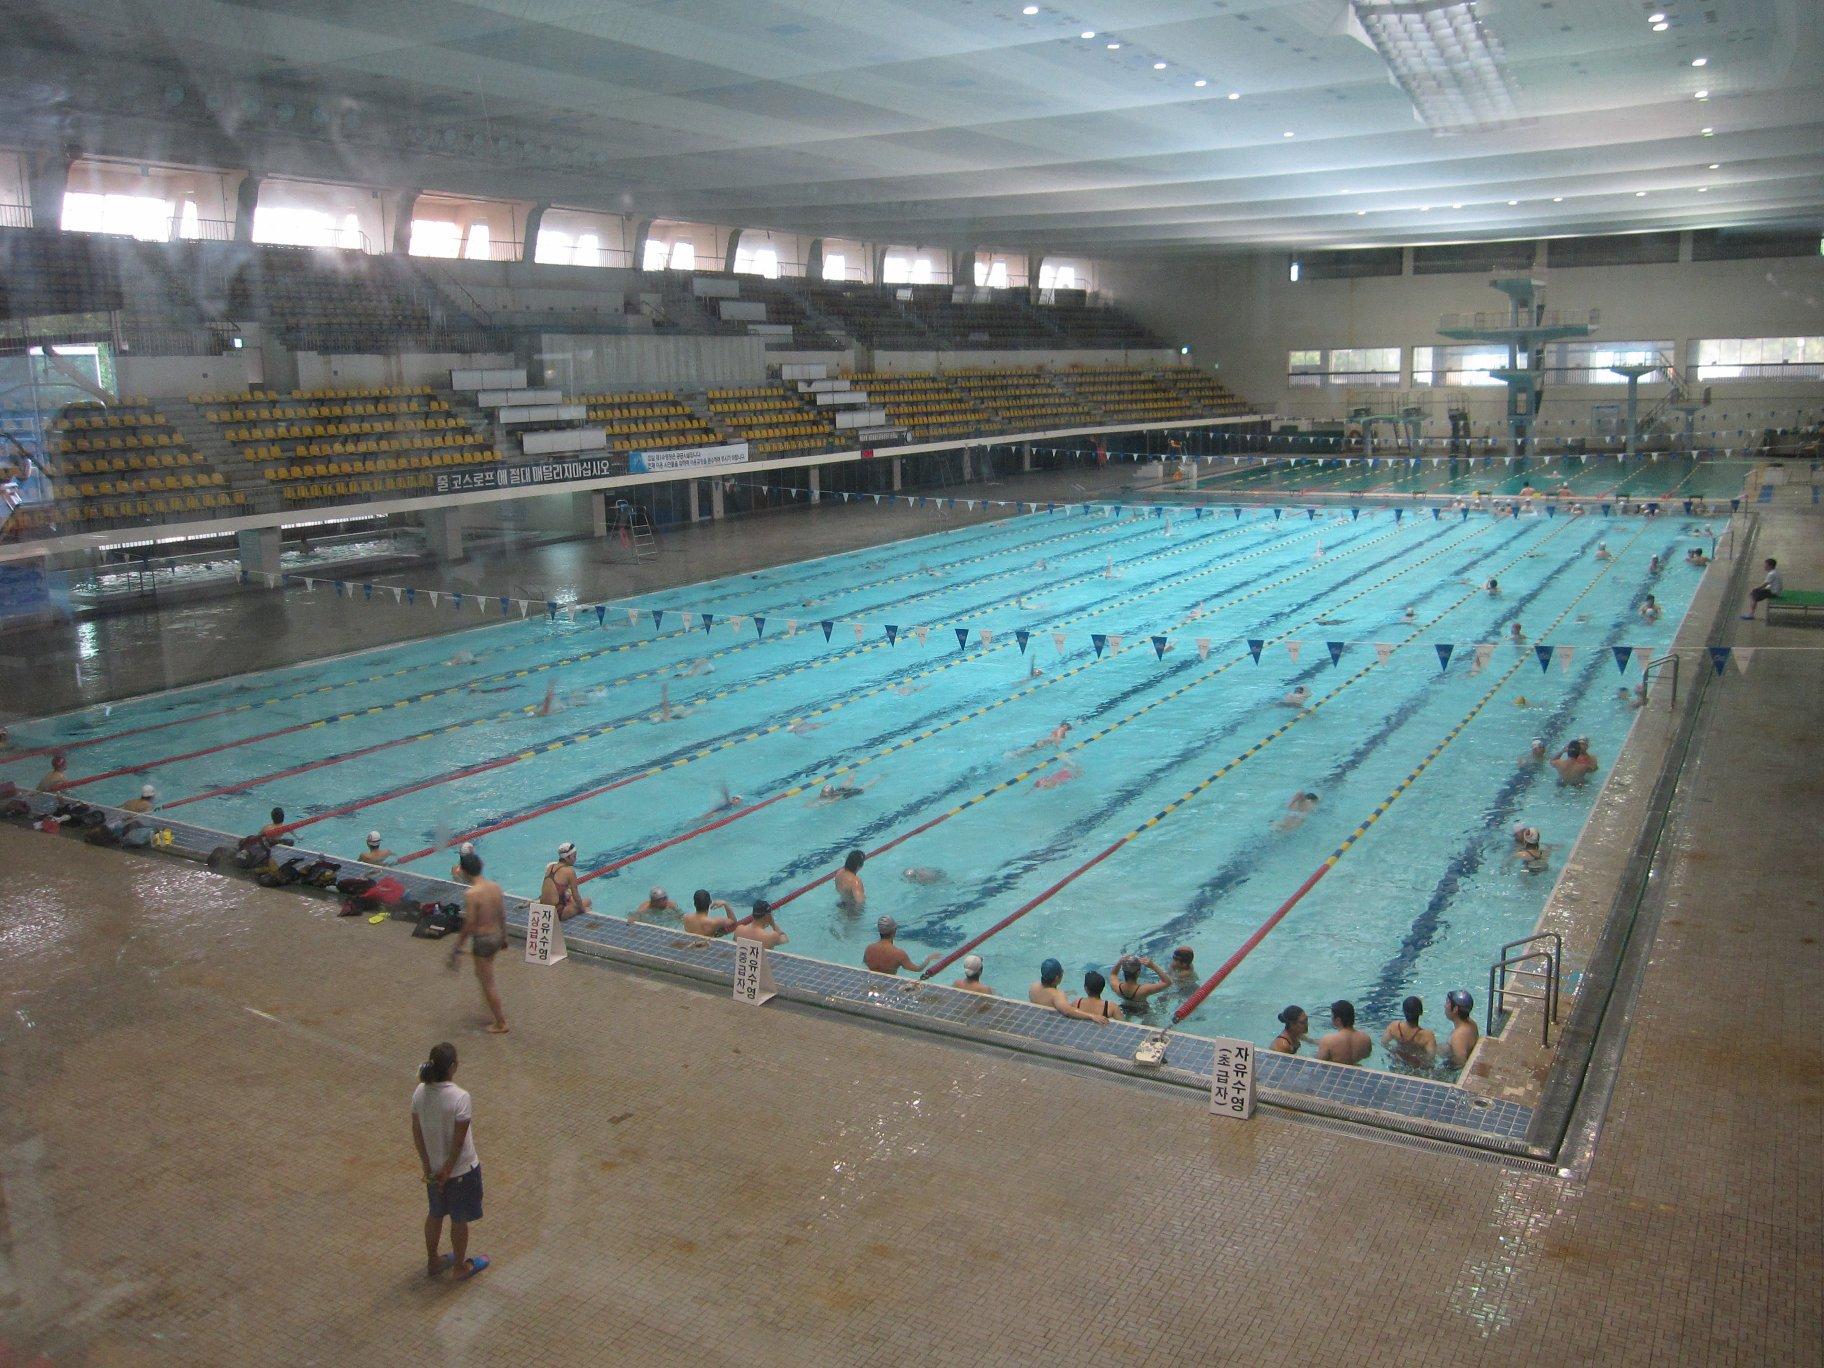 Opinions On Jamsil Indoor Swimming Pool